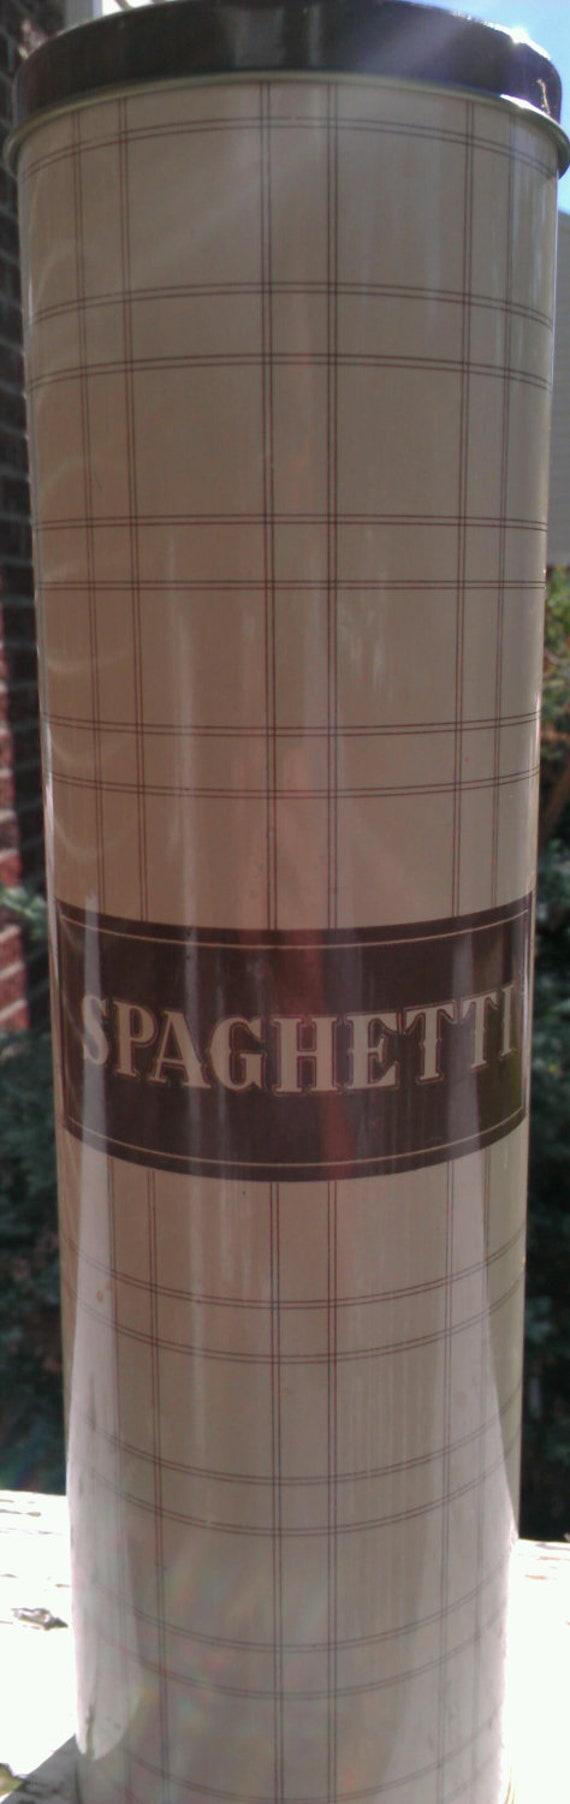 Spaghetti Holder/Tin